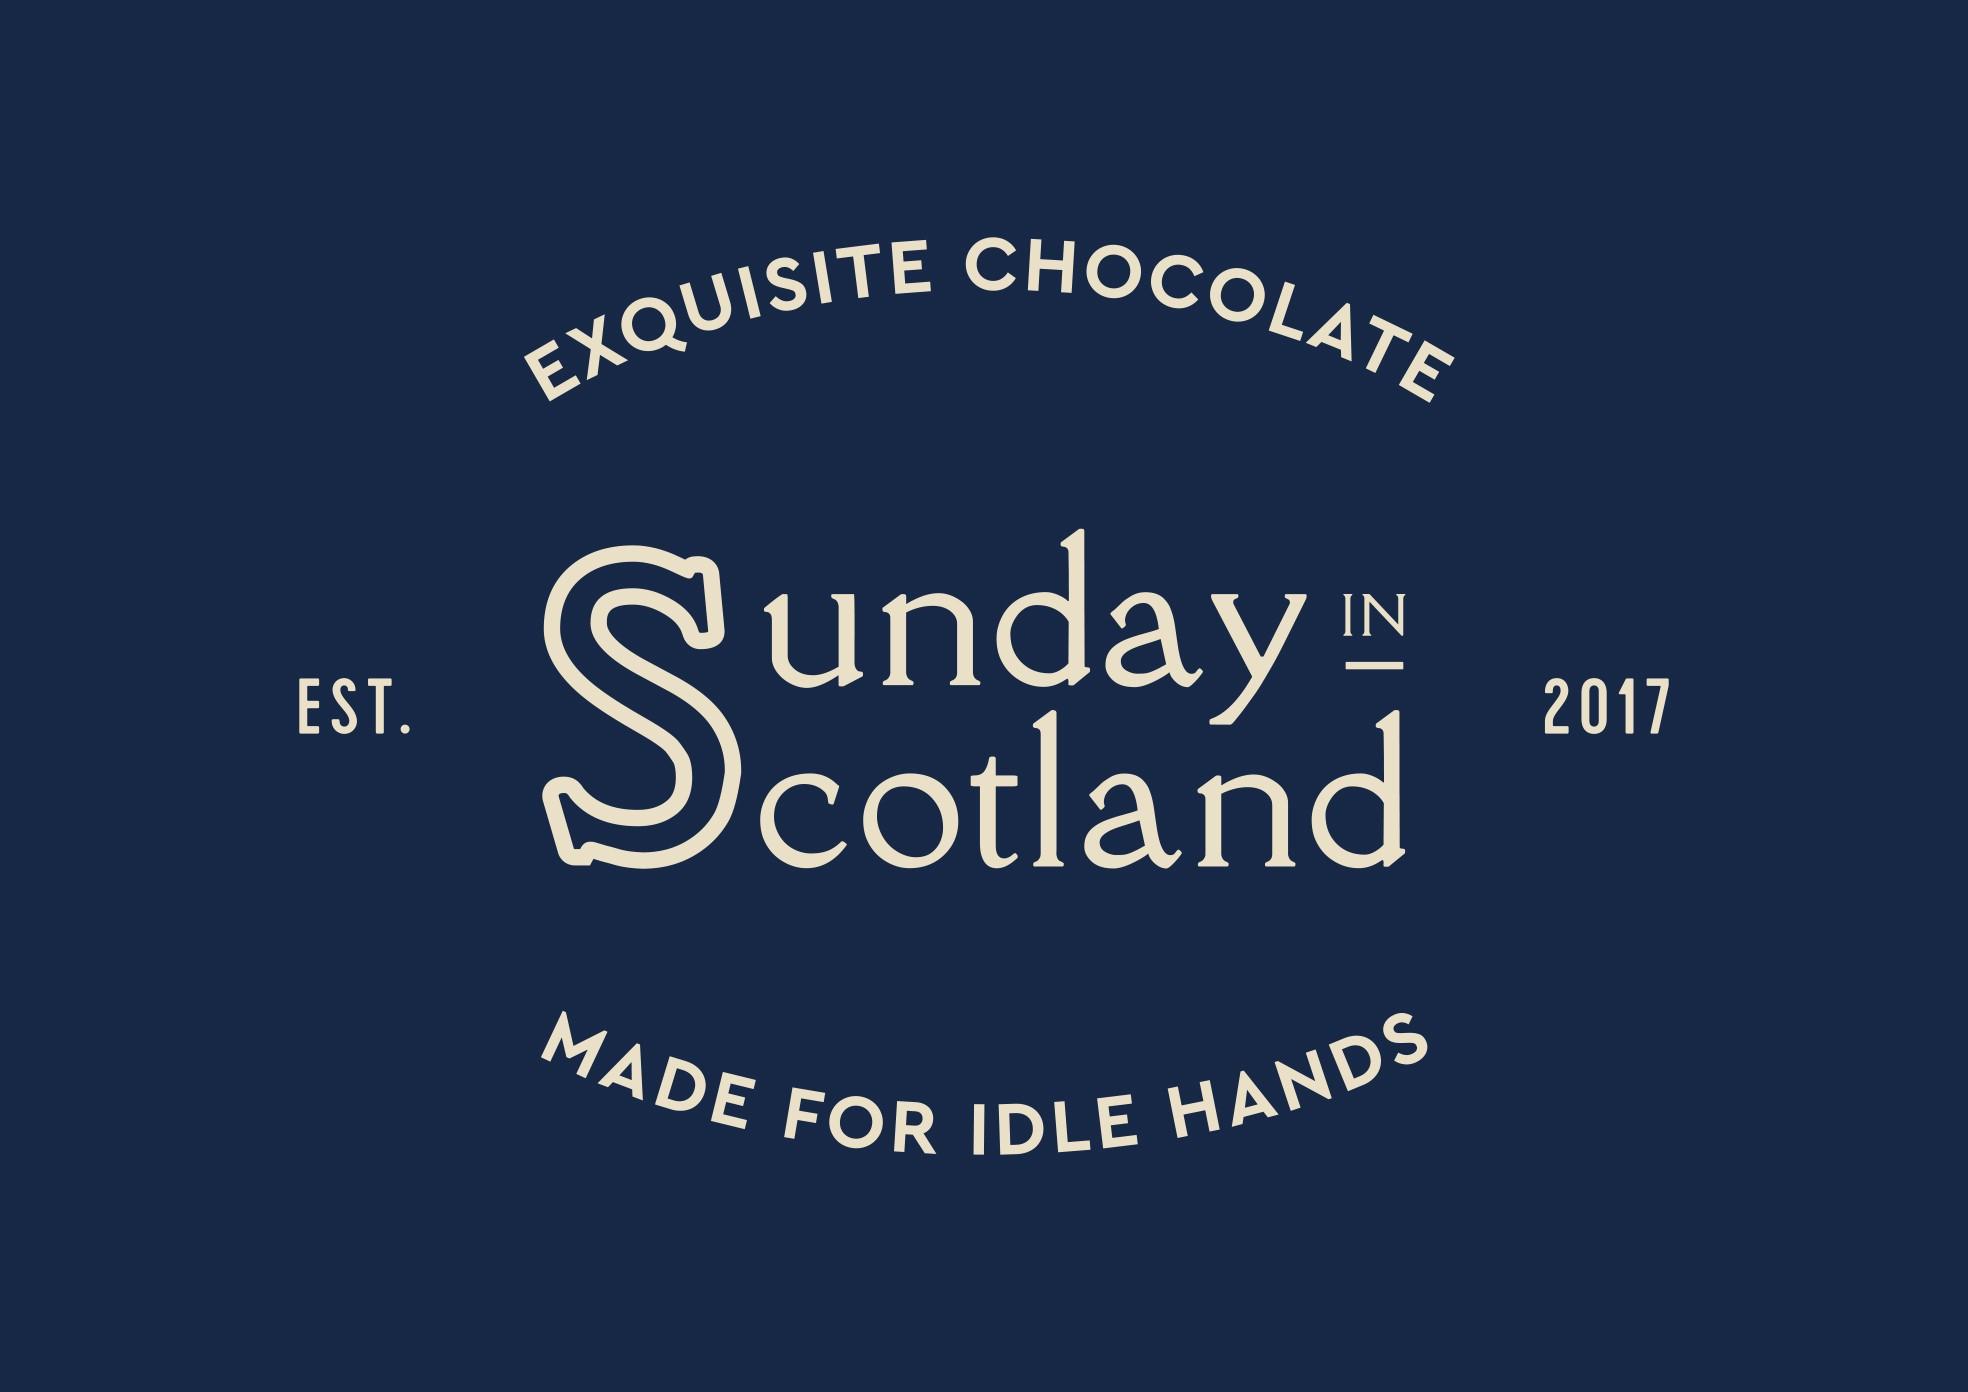 Sunday-in-scotland-1